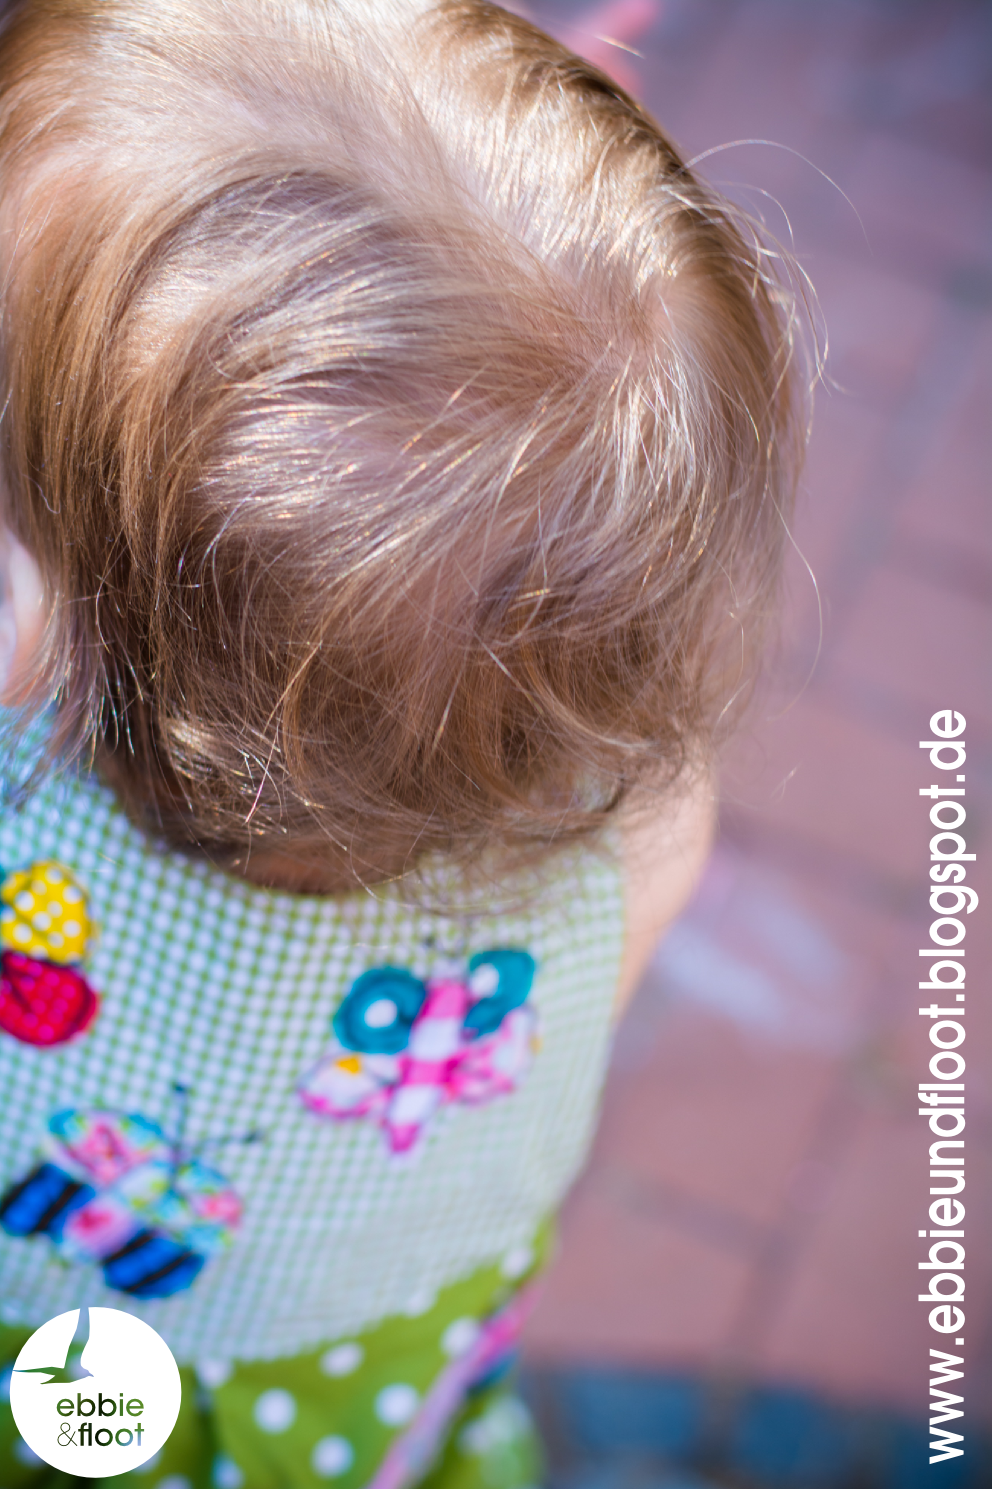 ebbie und floot_farbenmix_Cara_Kleid_Dress_birthday dress_Cake_Ballon_ribbons_ruffels_green_dots_03